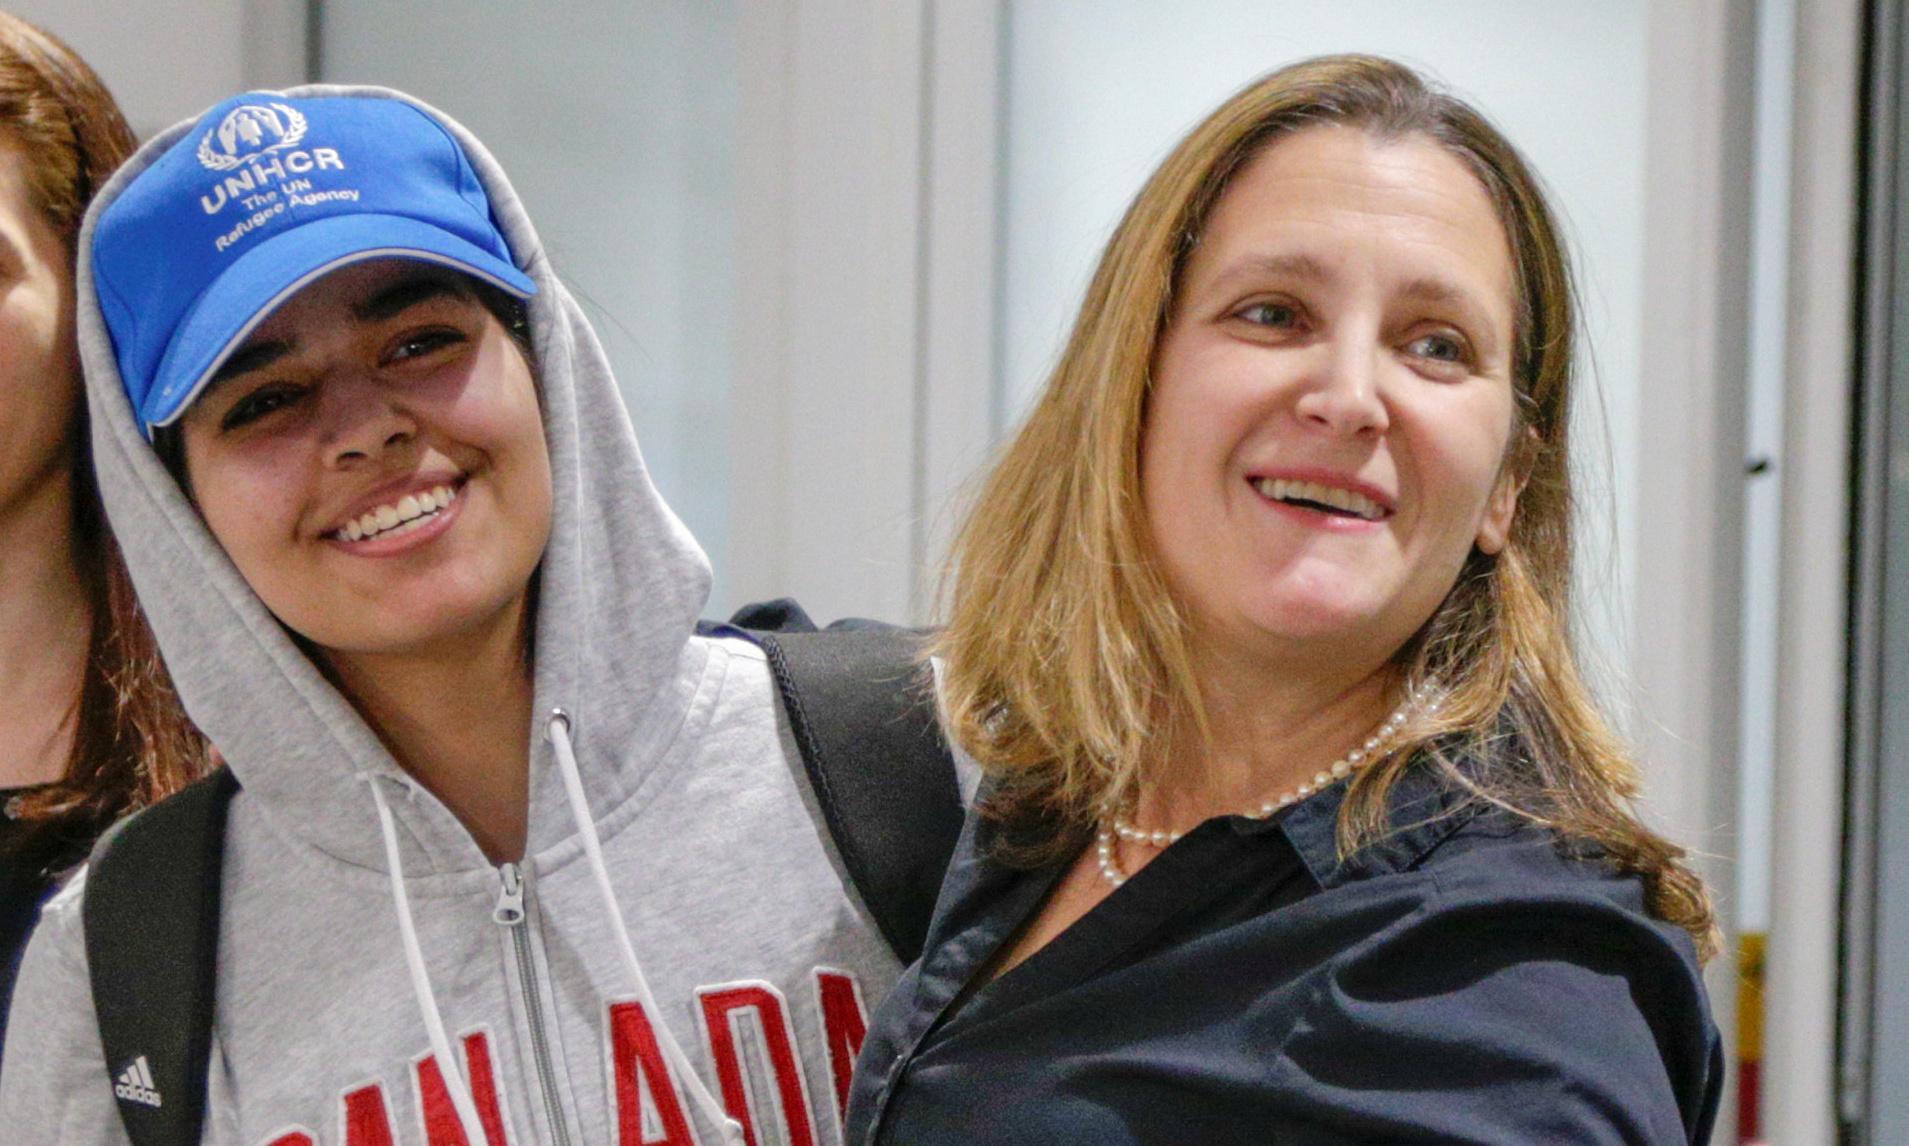 Rahaf al-Qunun lands in Toronto after long journey to safety